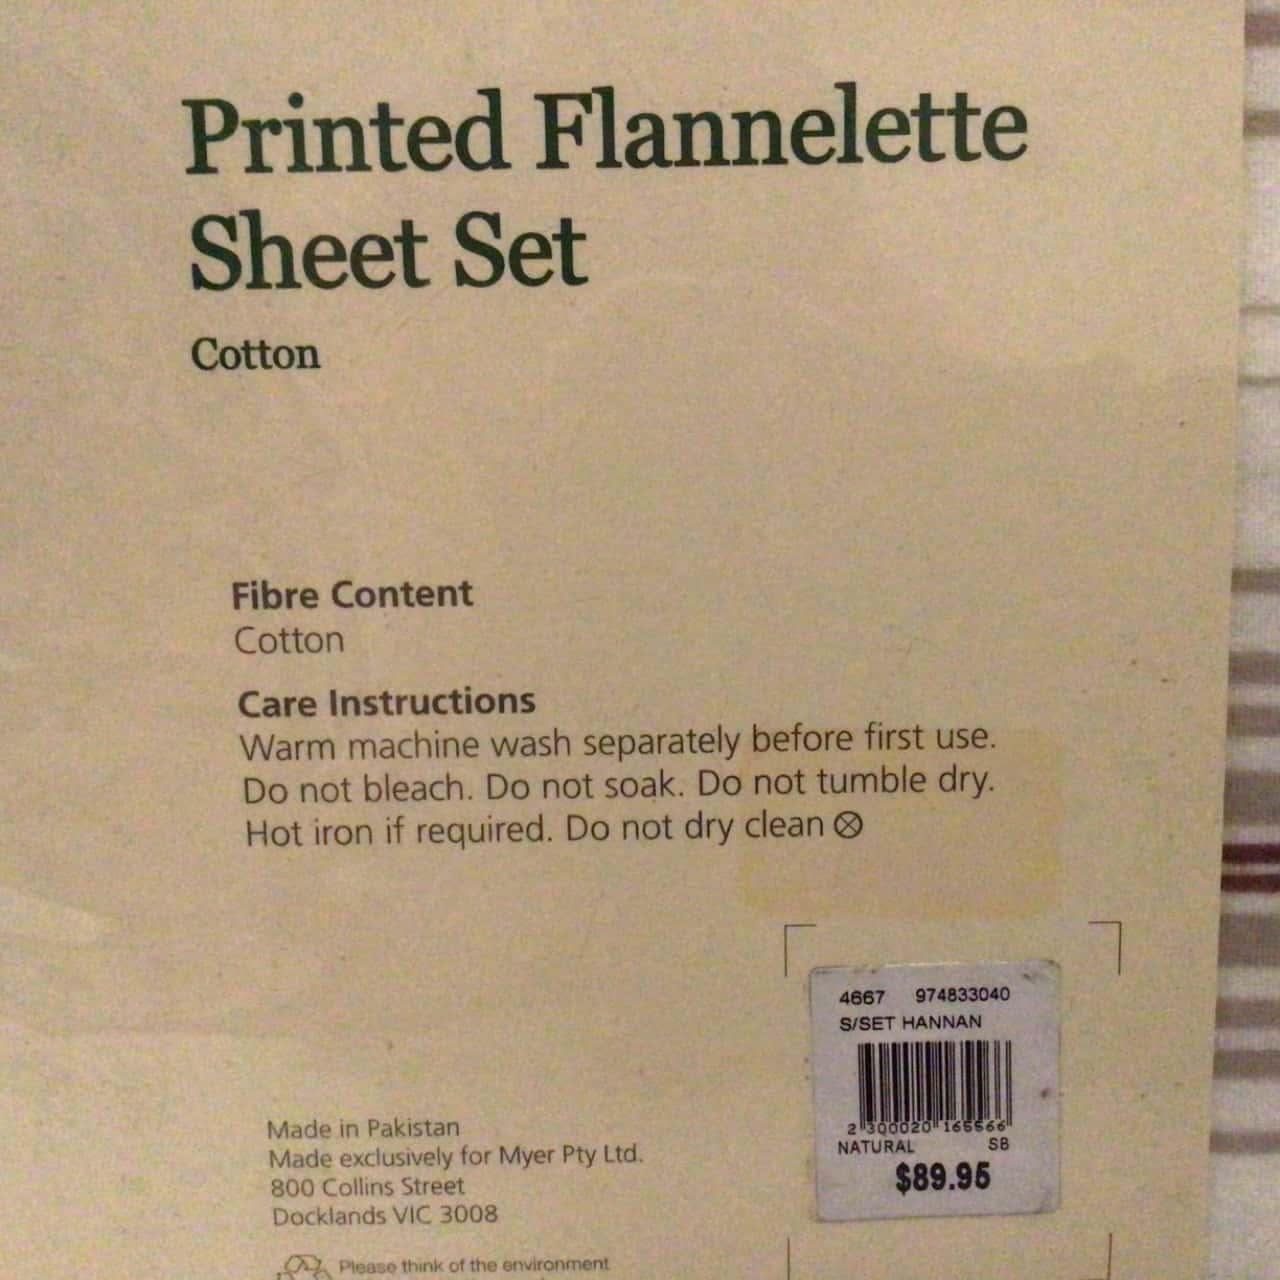 BNWT MYER HERITAGE SINGLE BED PRINTED FLANNELETTE RRP SHEET SET  RRP $89.95